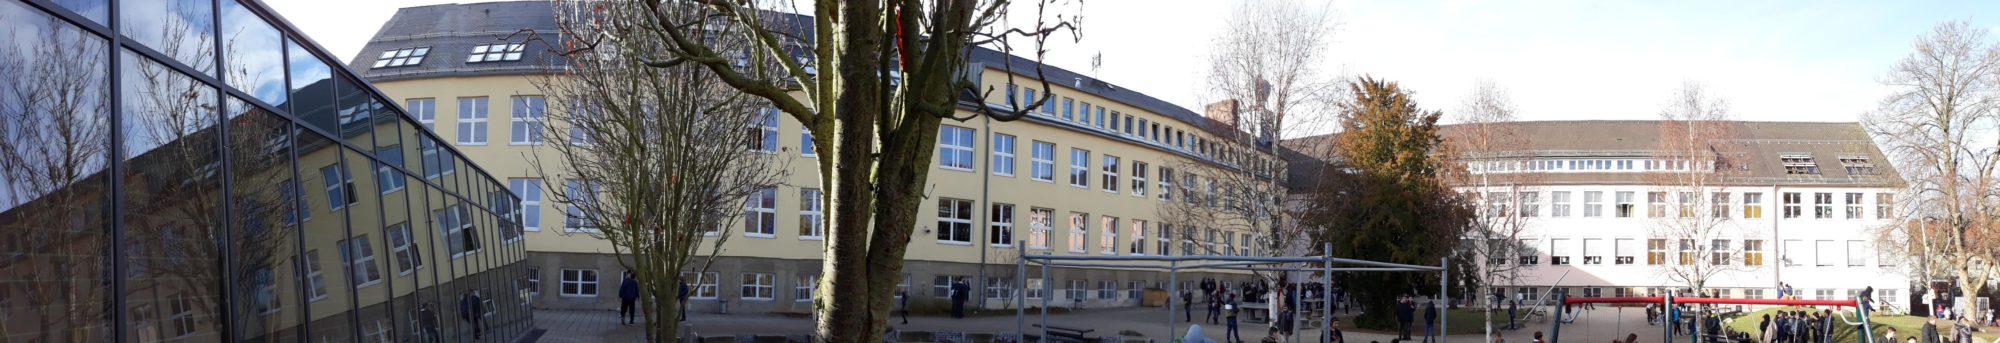 St.-Wolfgang-Mittelschule Regensburg